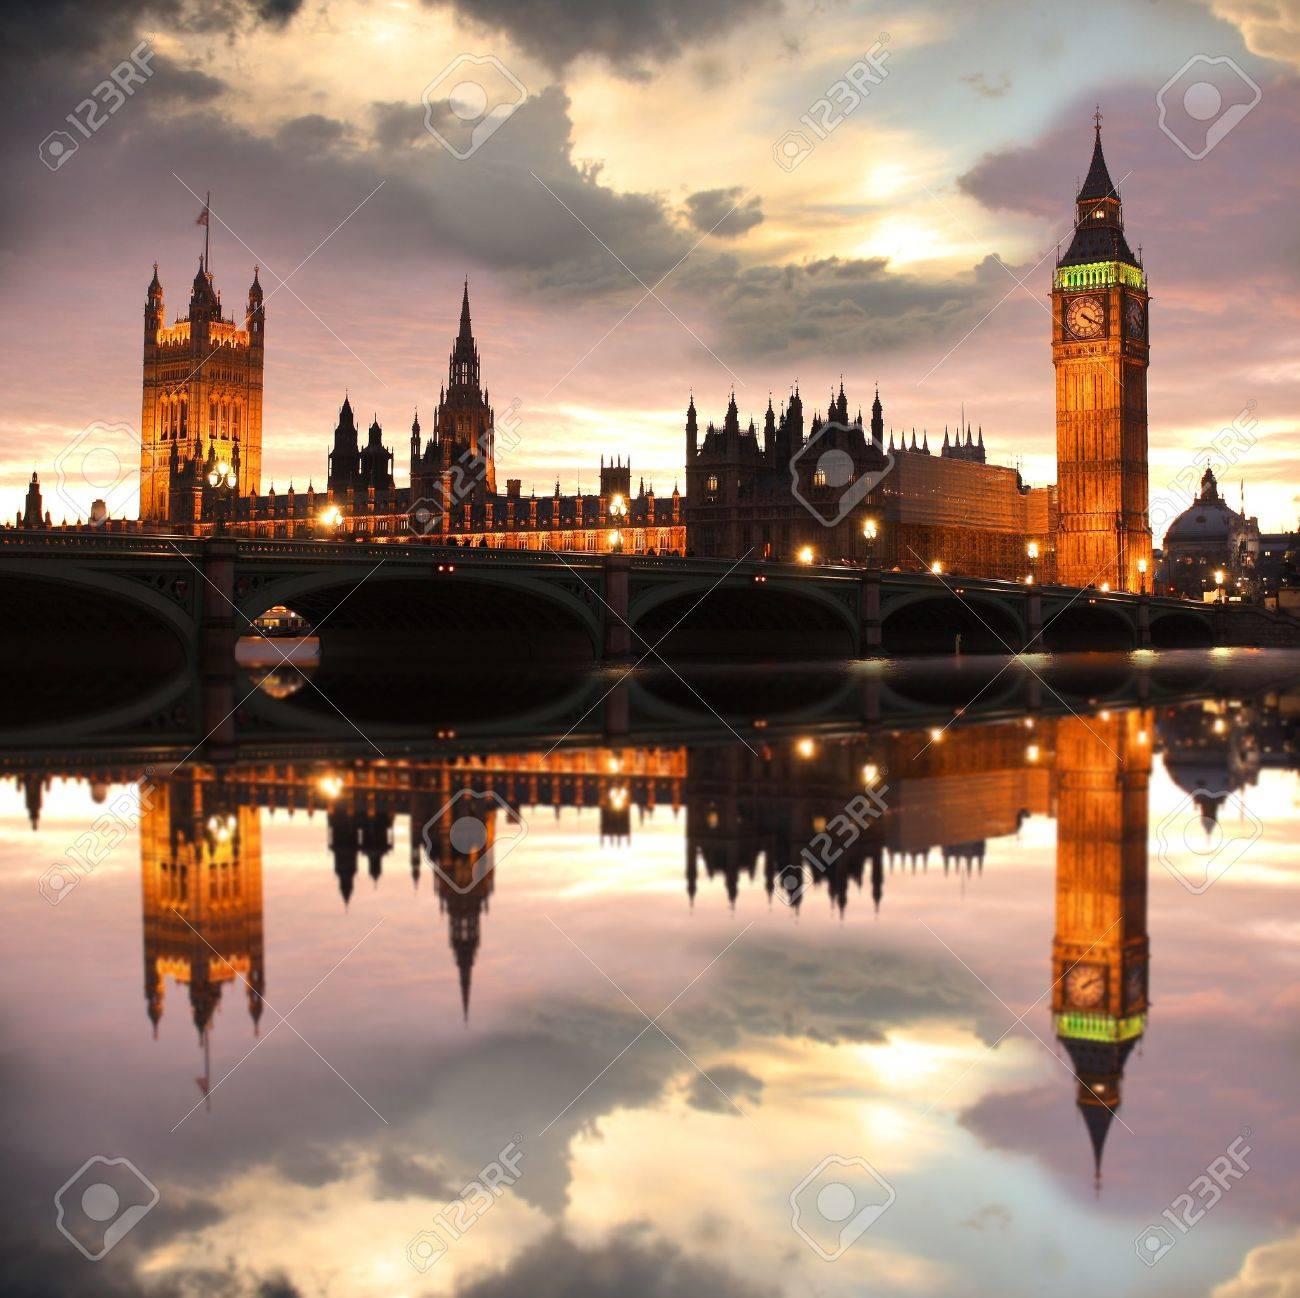 Big Ben in the evening, London, UK Stock Photo - 11997051